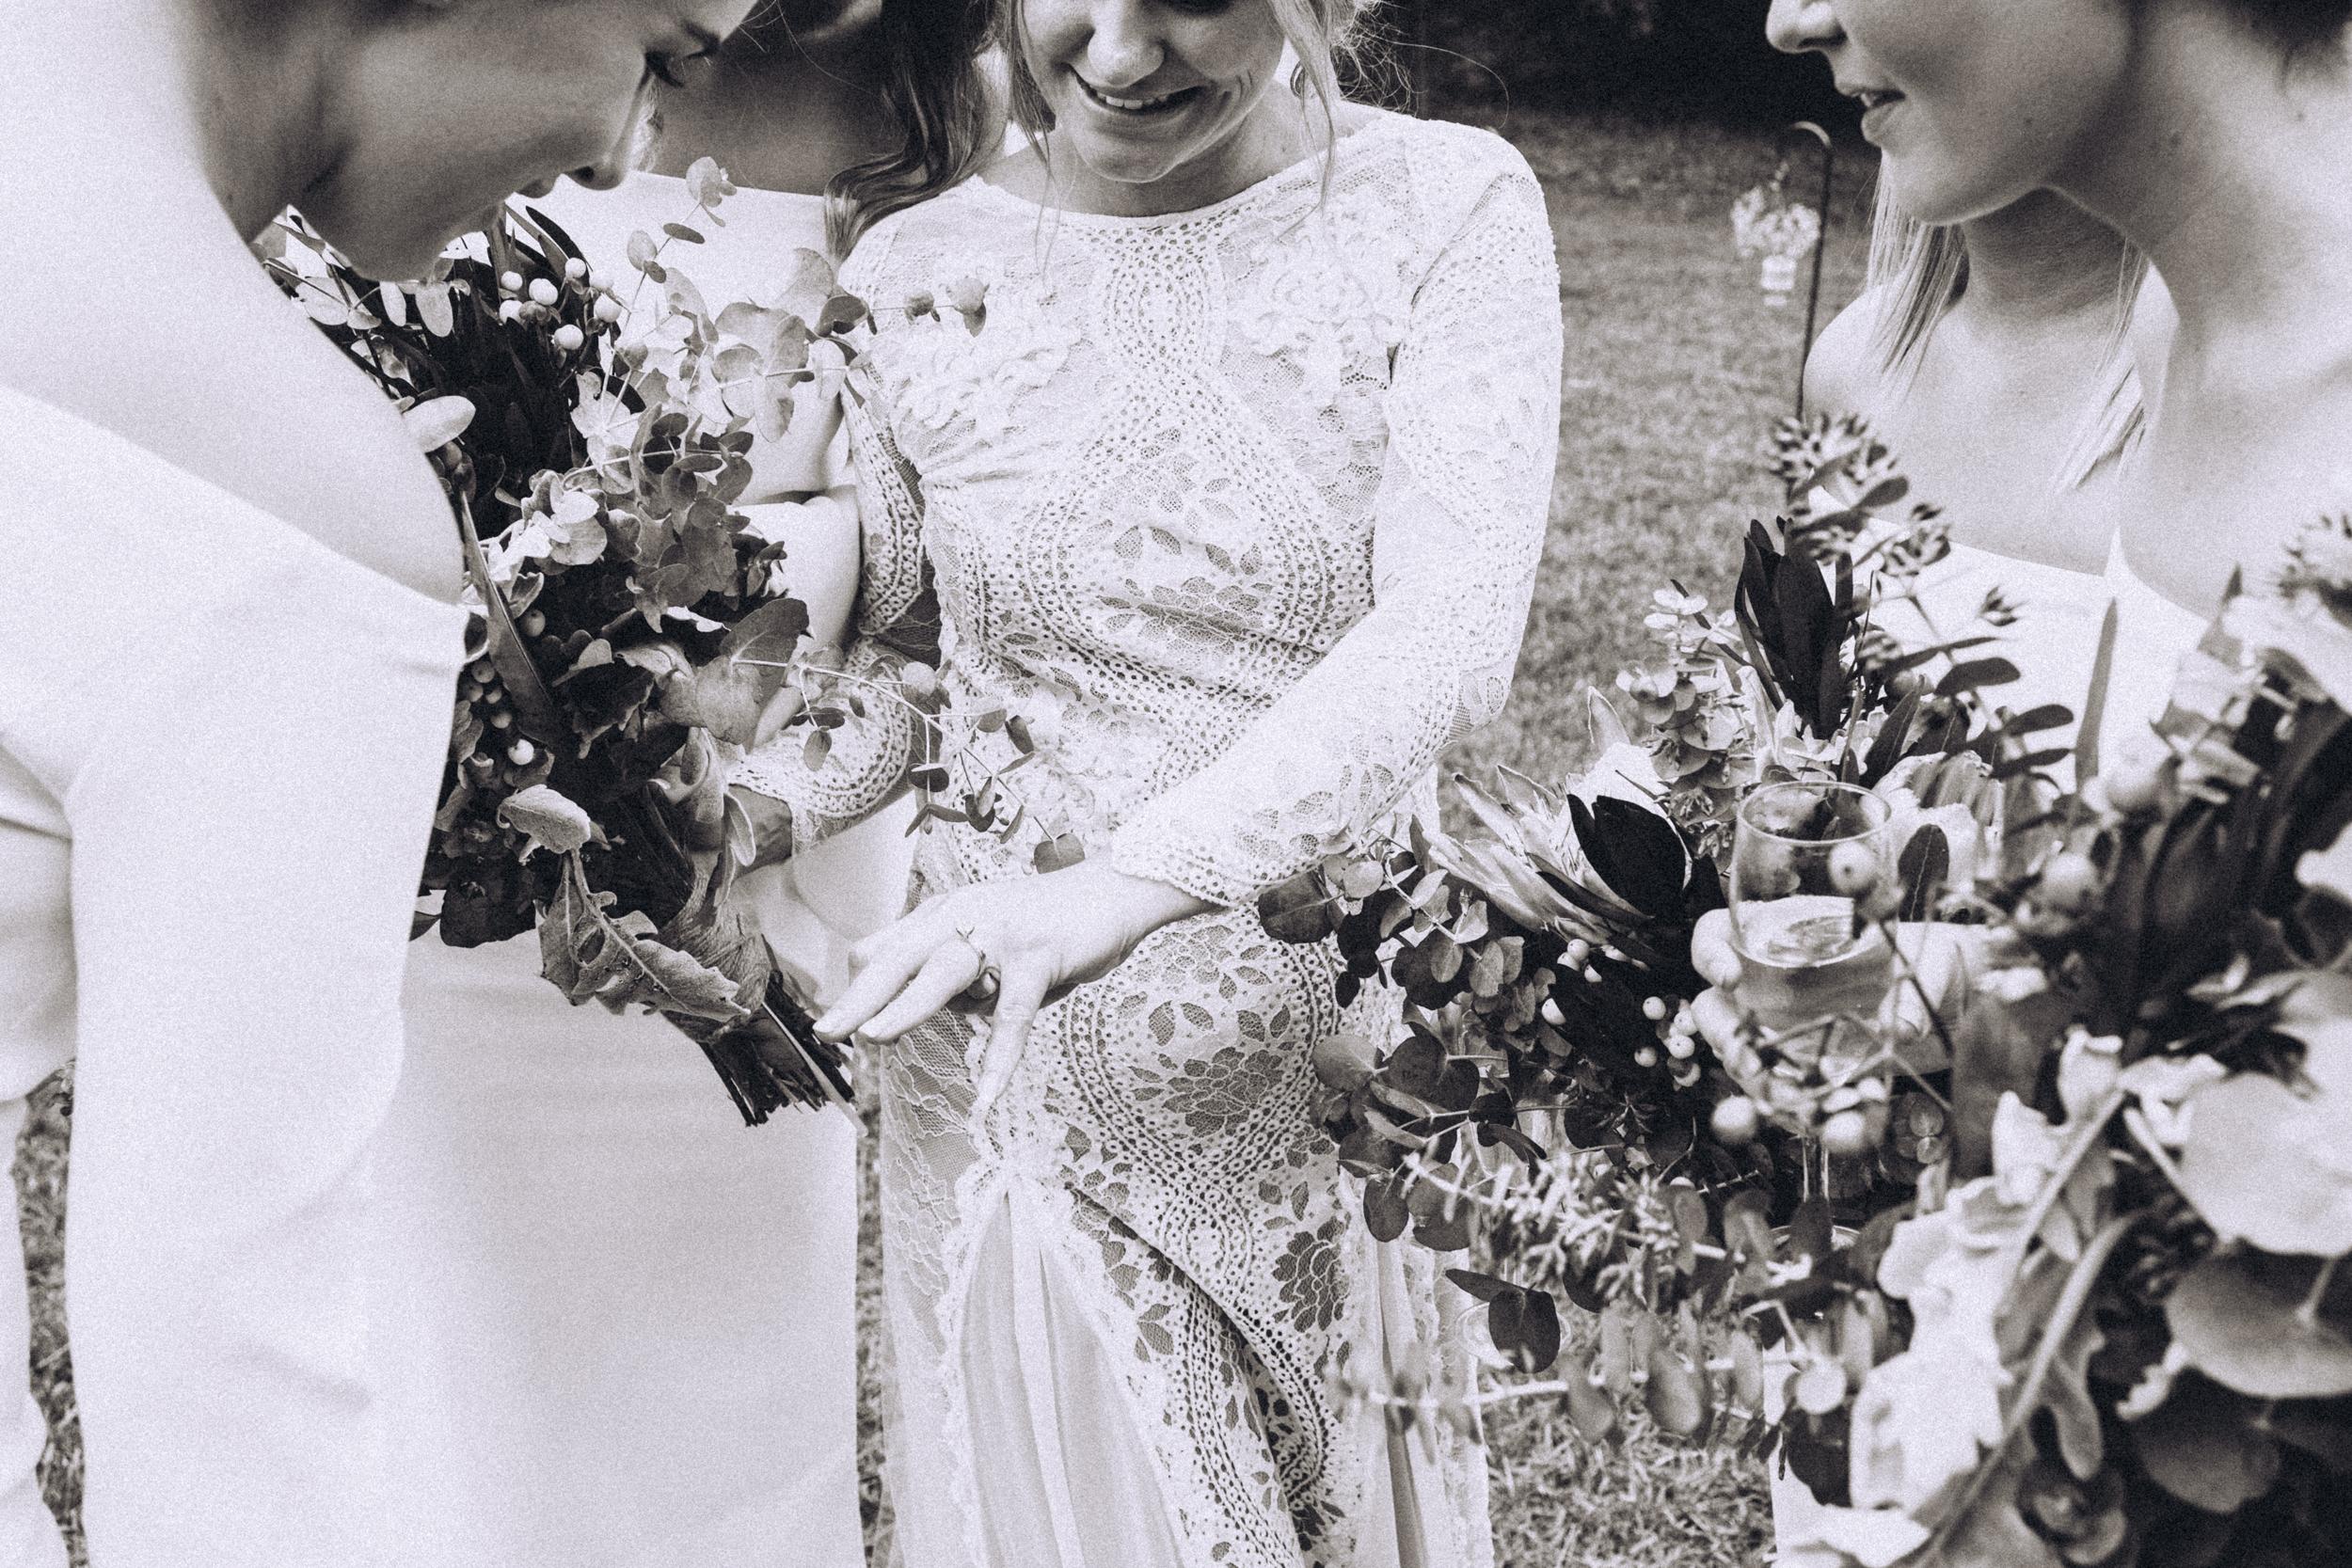 Bridal-Party_B&W_swalklate-3.jpg